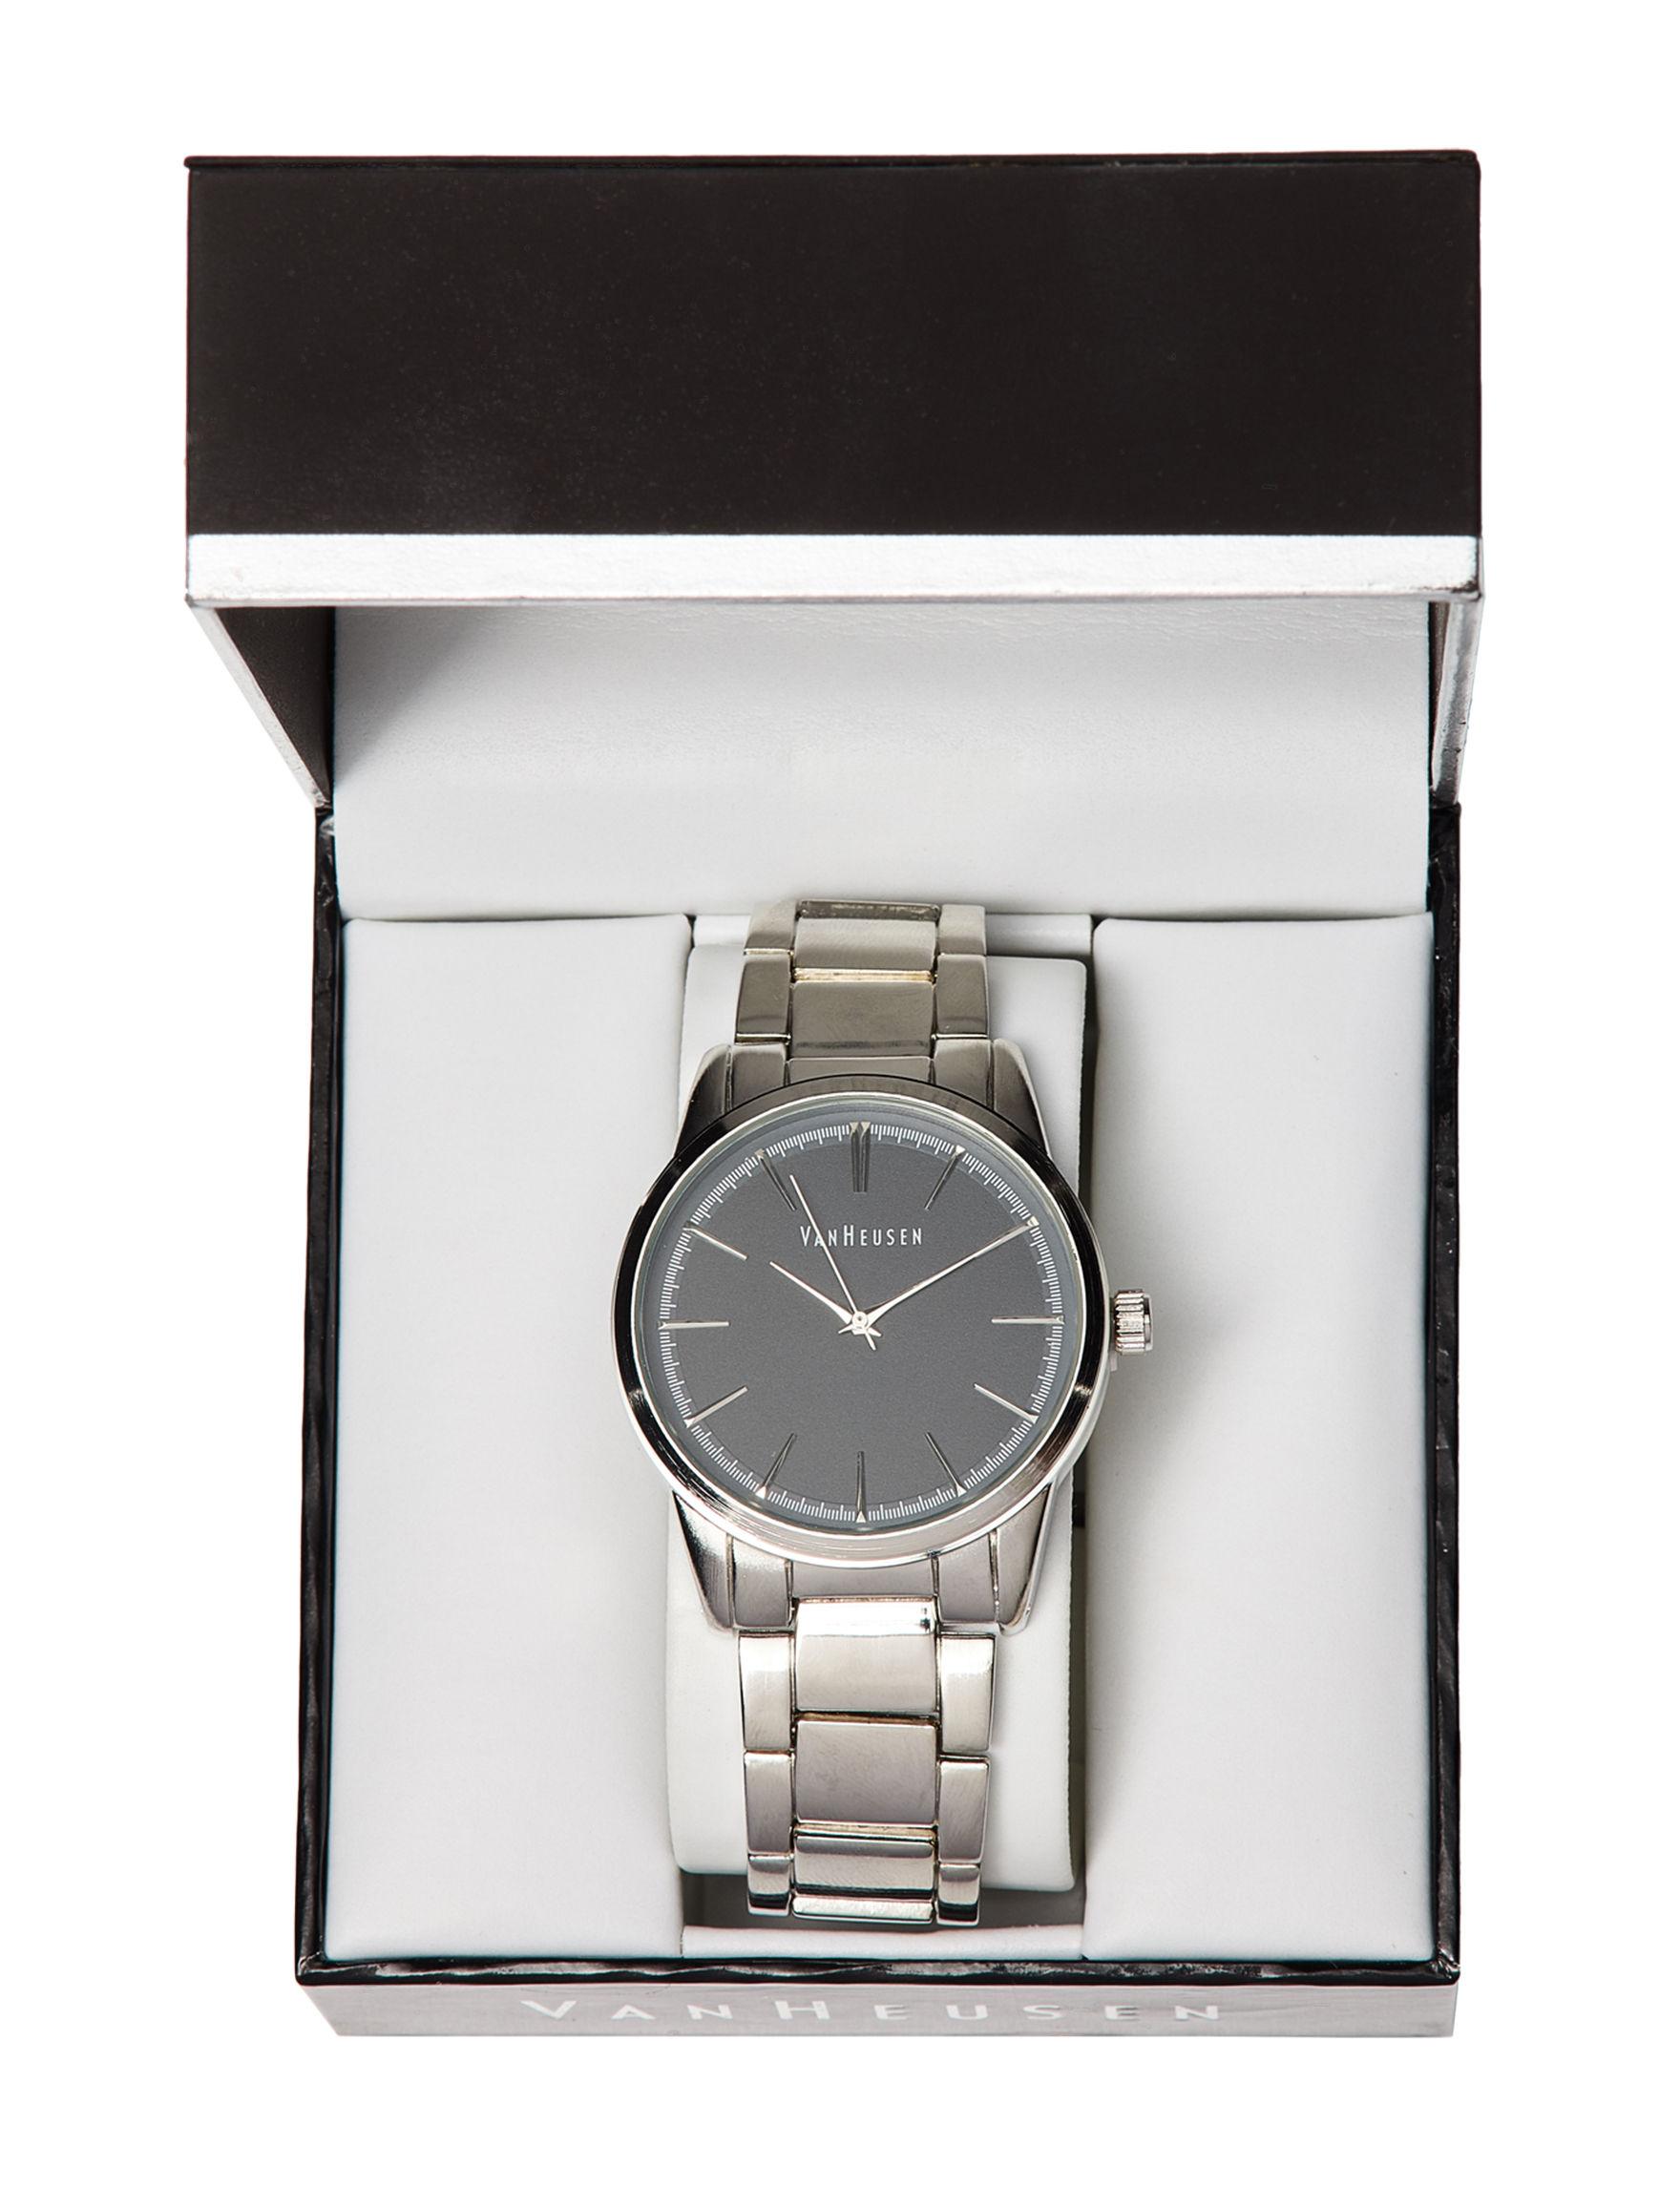 Van Heusen Silver Fashion Watches